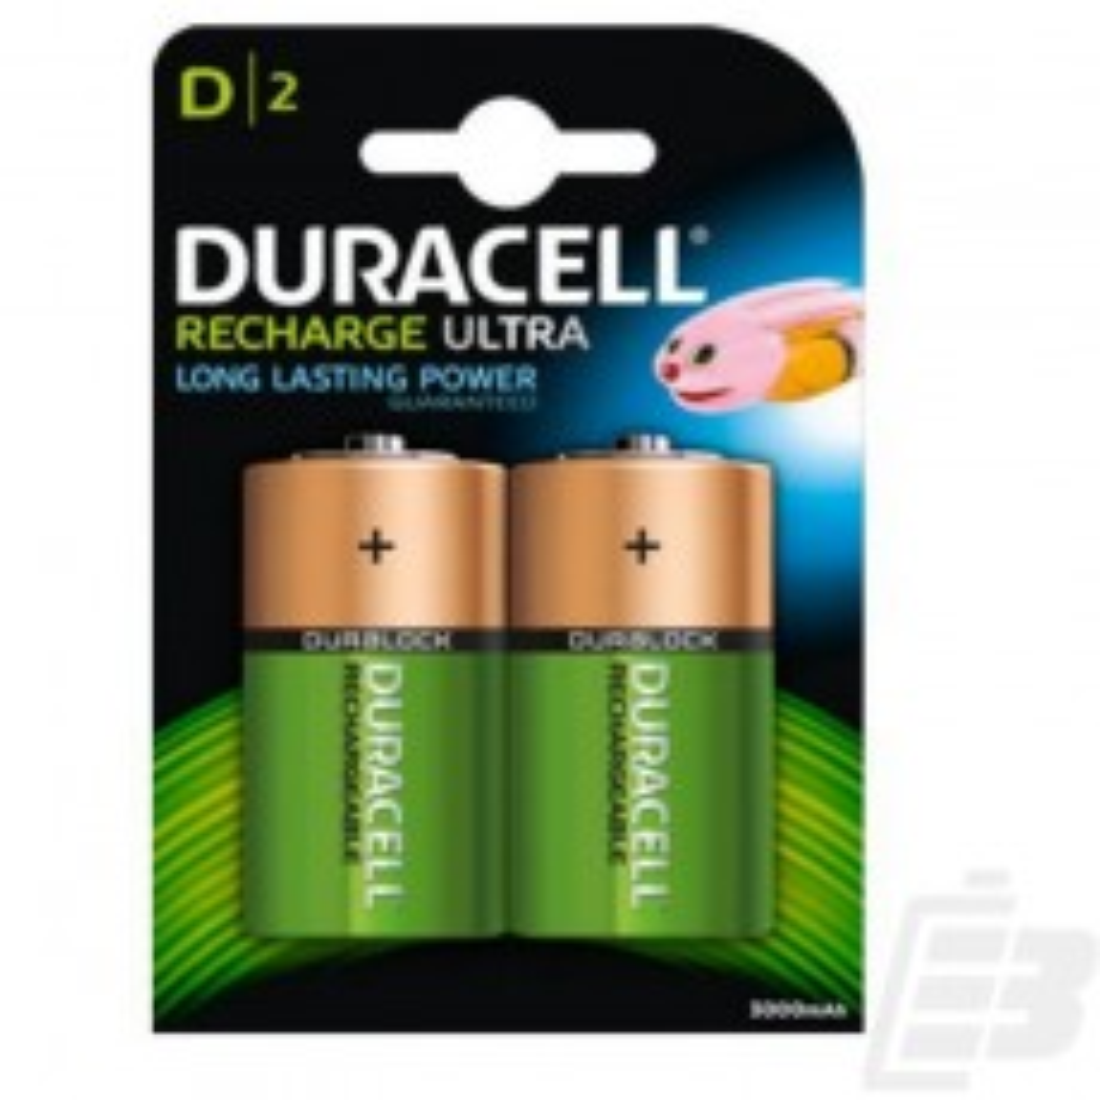 Duracell HR20 D Rechargeable Battery 3000mah 1